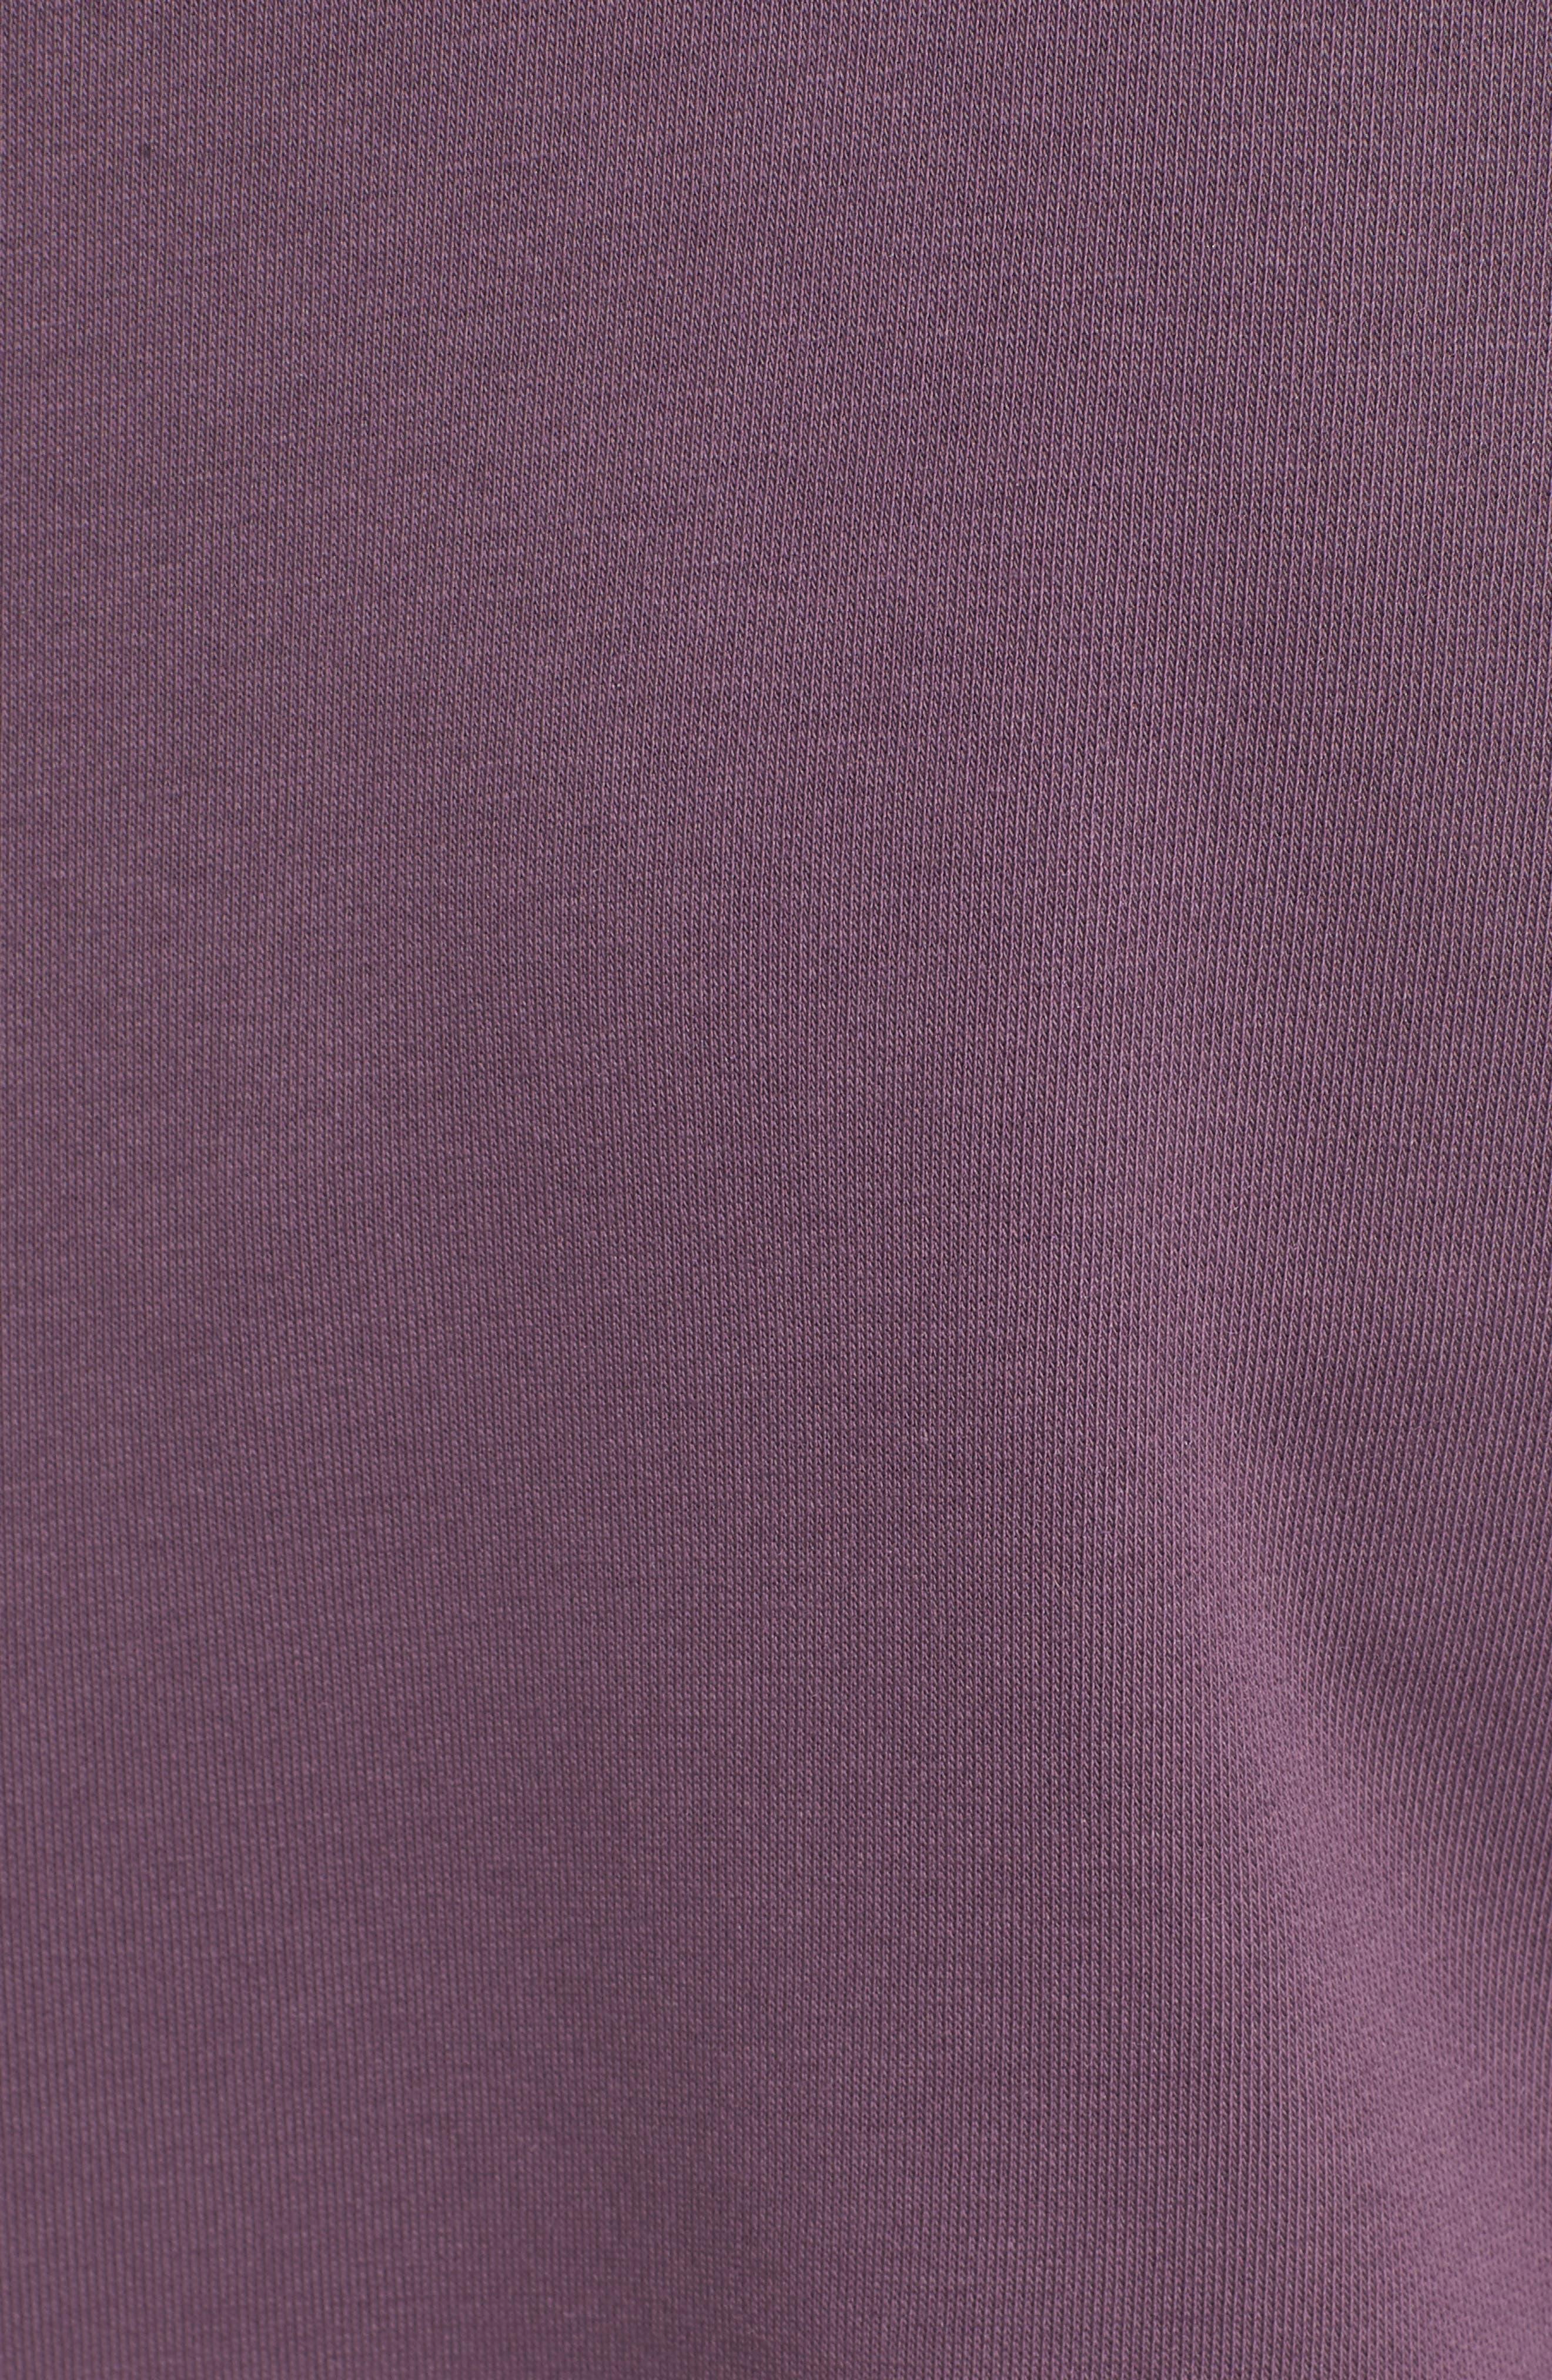 Ruffle Sweatshirt,                             Alternate thumbnail 10, color,